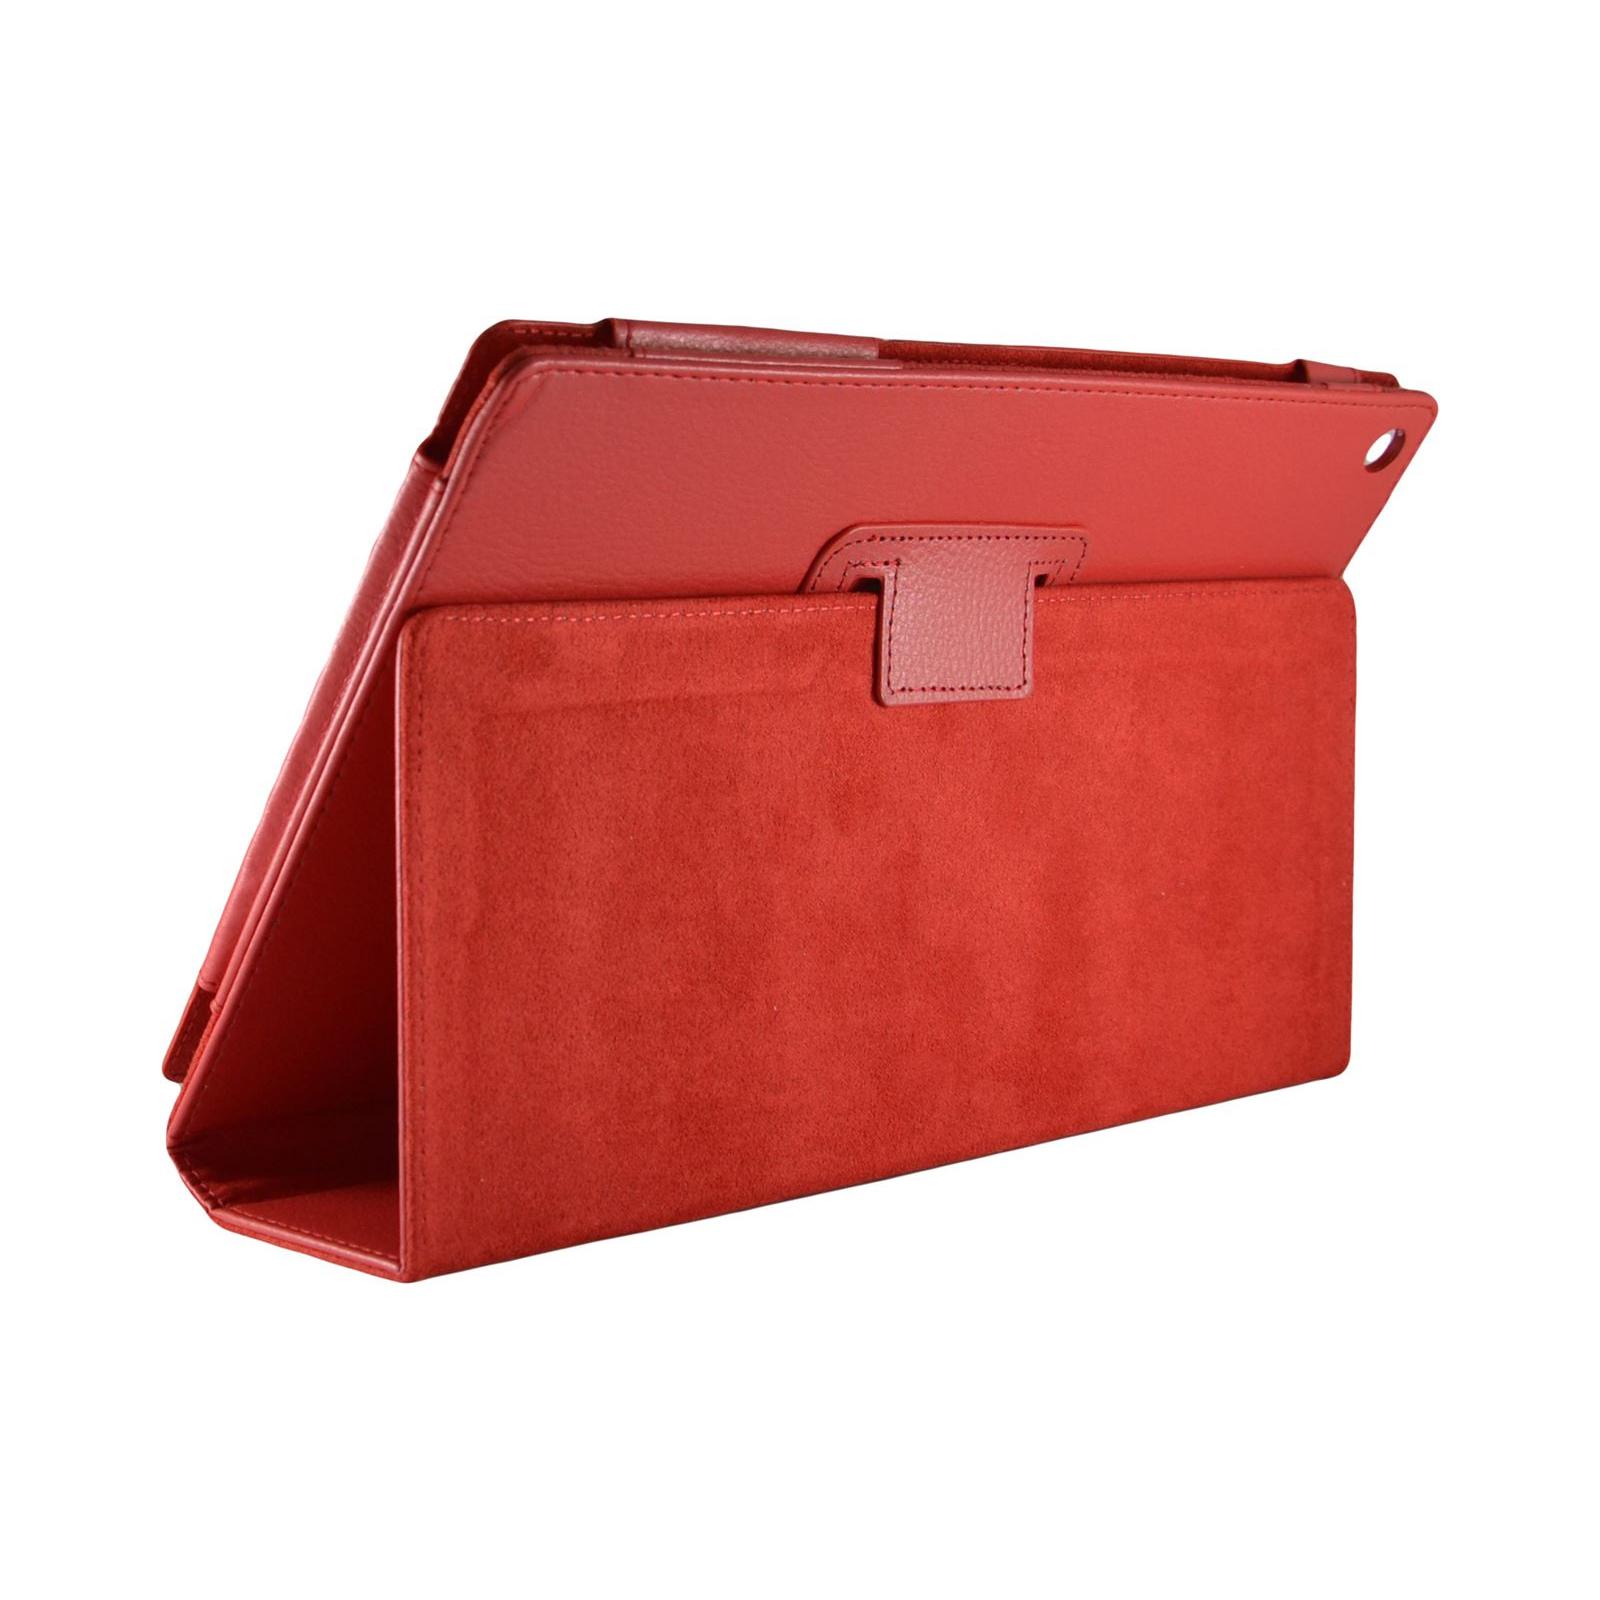 "Чехол для планшета Pro-case 10,1"" Pro-case Sony Tablet Z2 red (PC STZ2red) изображение 3"